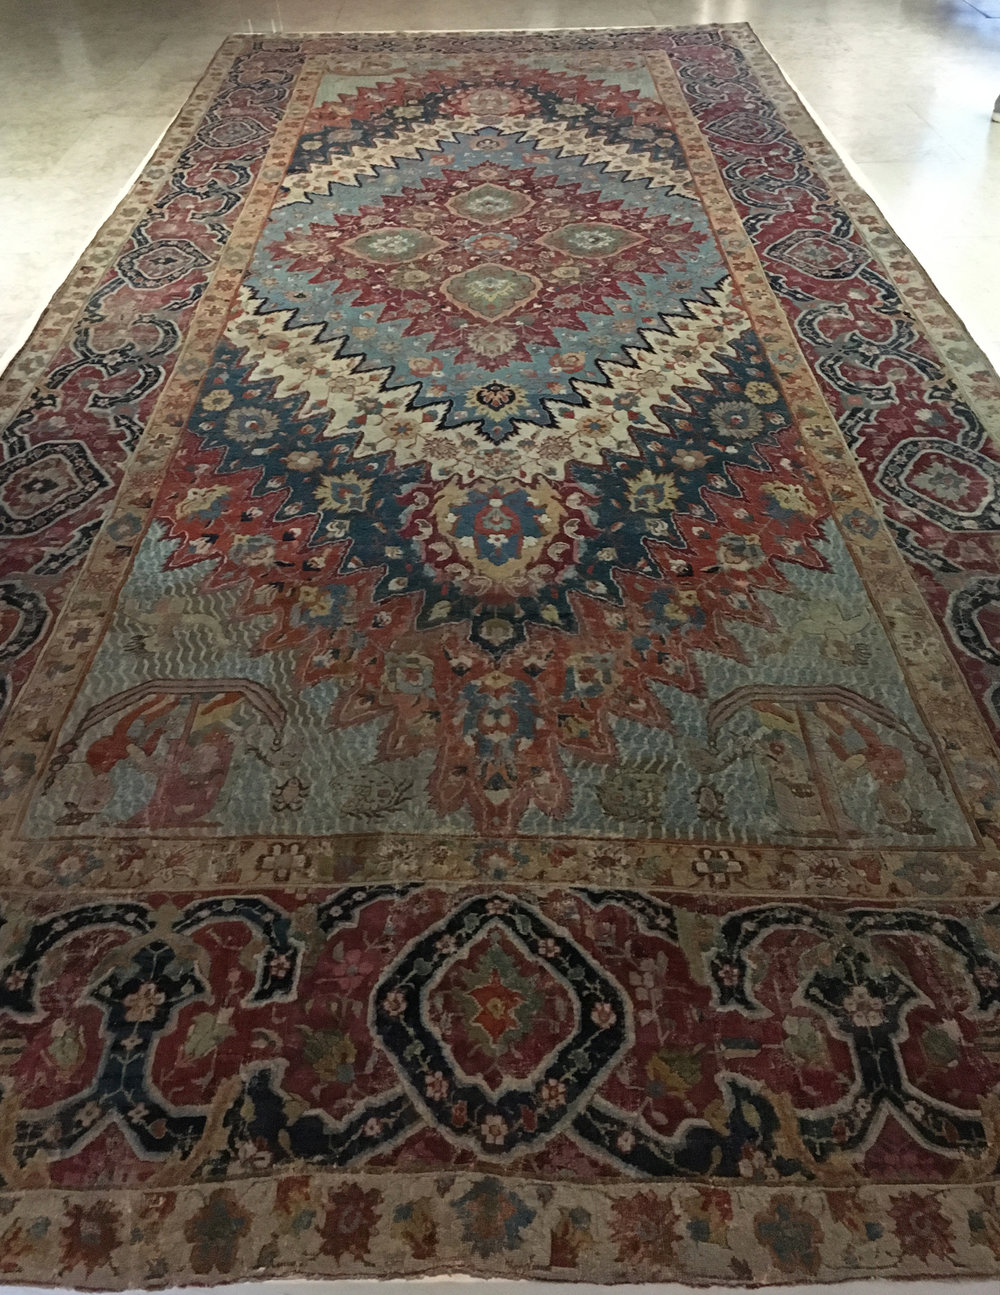 """Portuguese carpet"", Persia, Khorasan?, 17th century, Safavid period, wool pile. Calouste Gulbenkian Museum, Lisbon (Photograph J. Cook)"